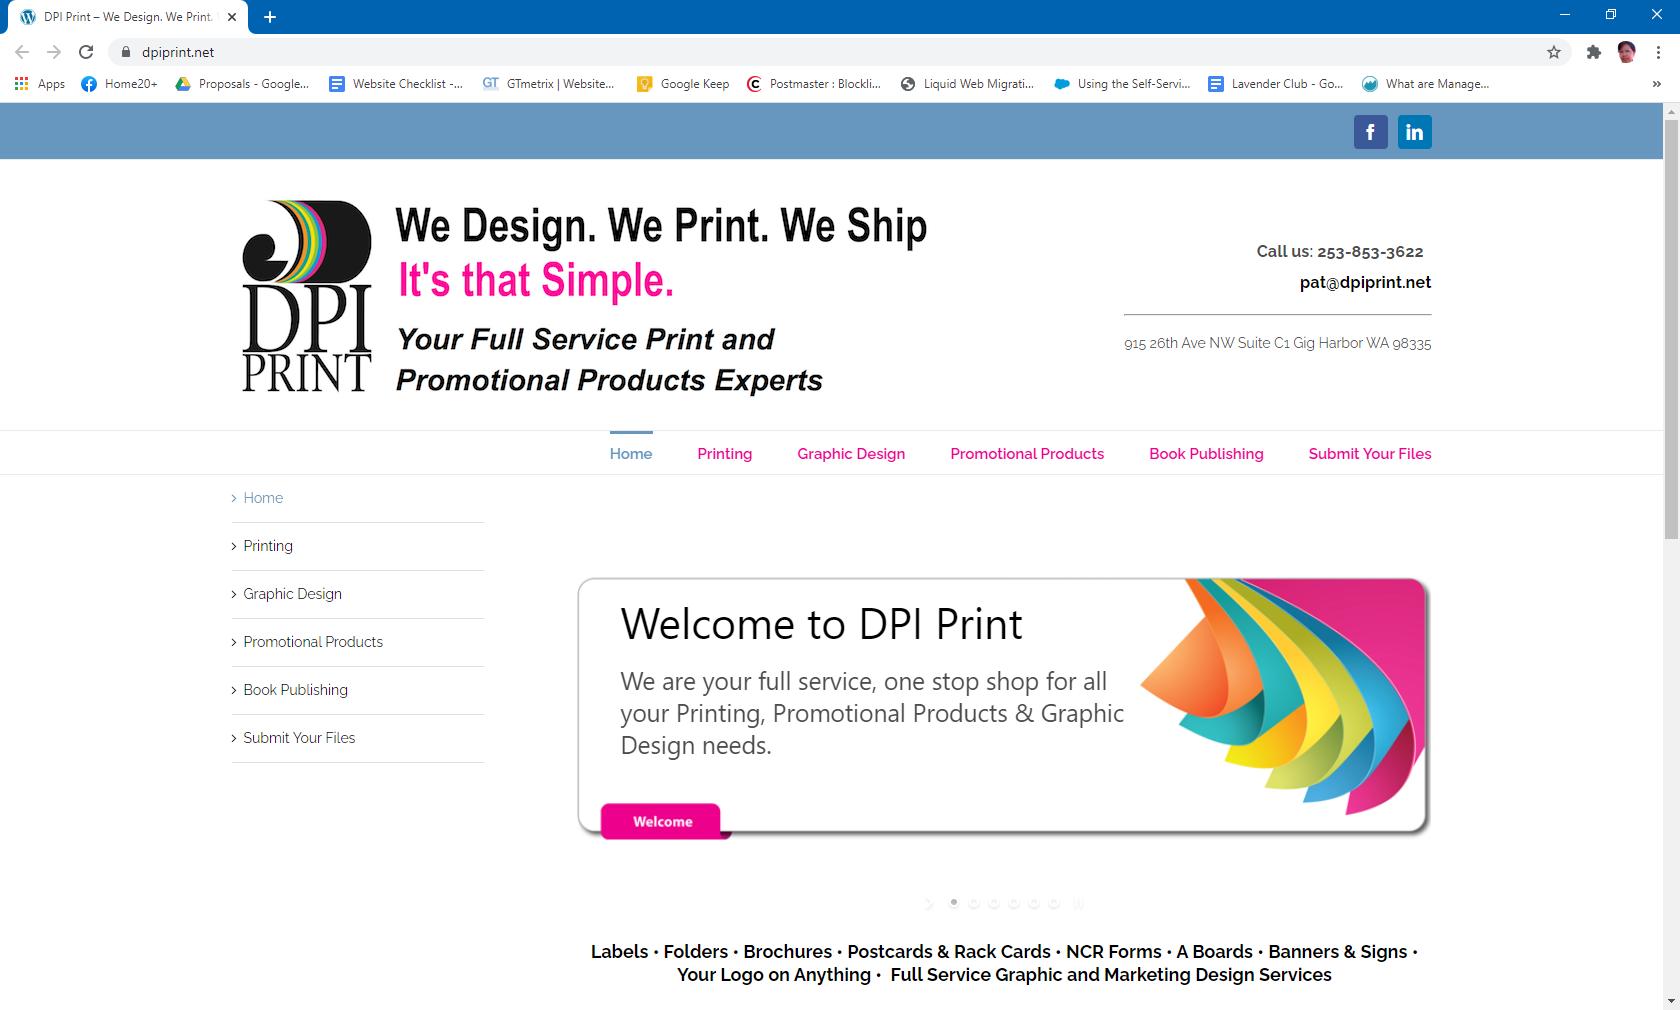 DPI Print